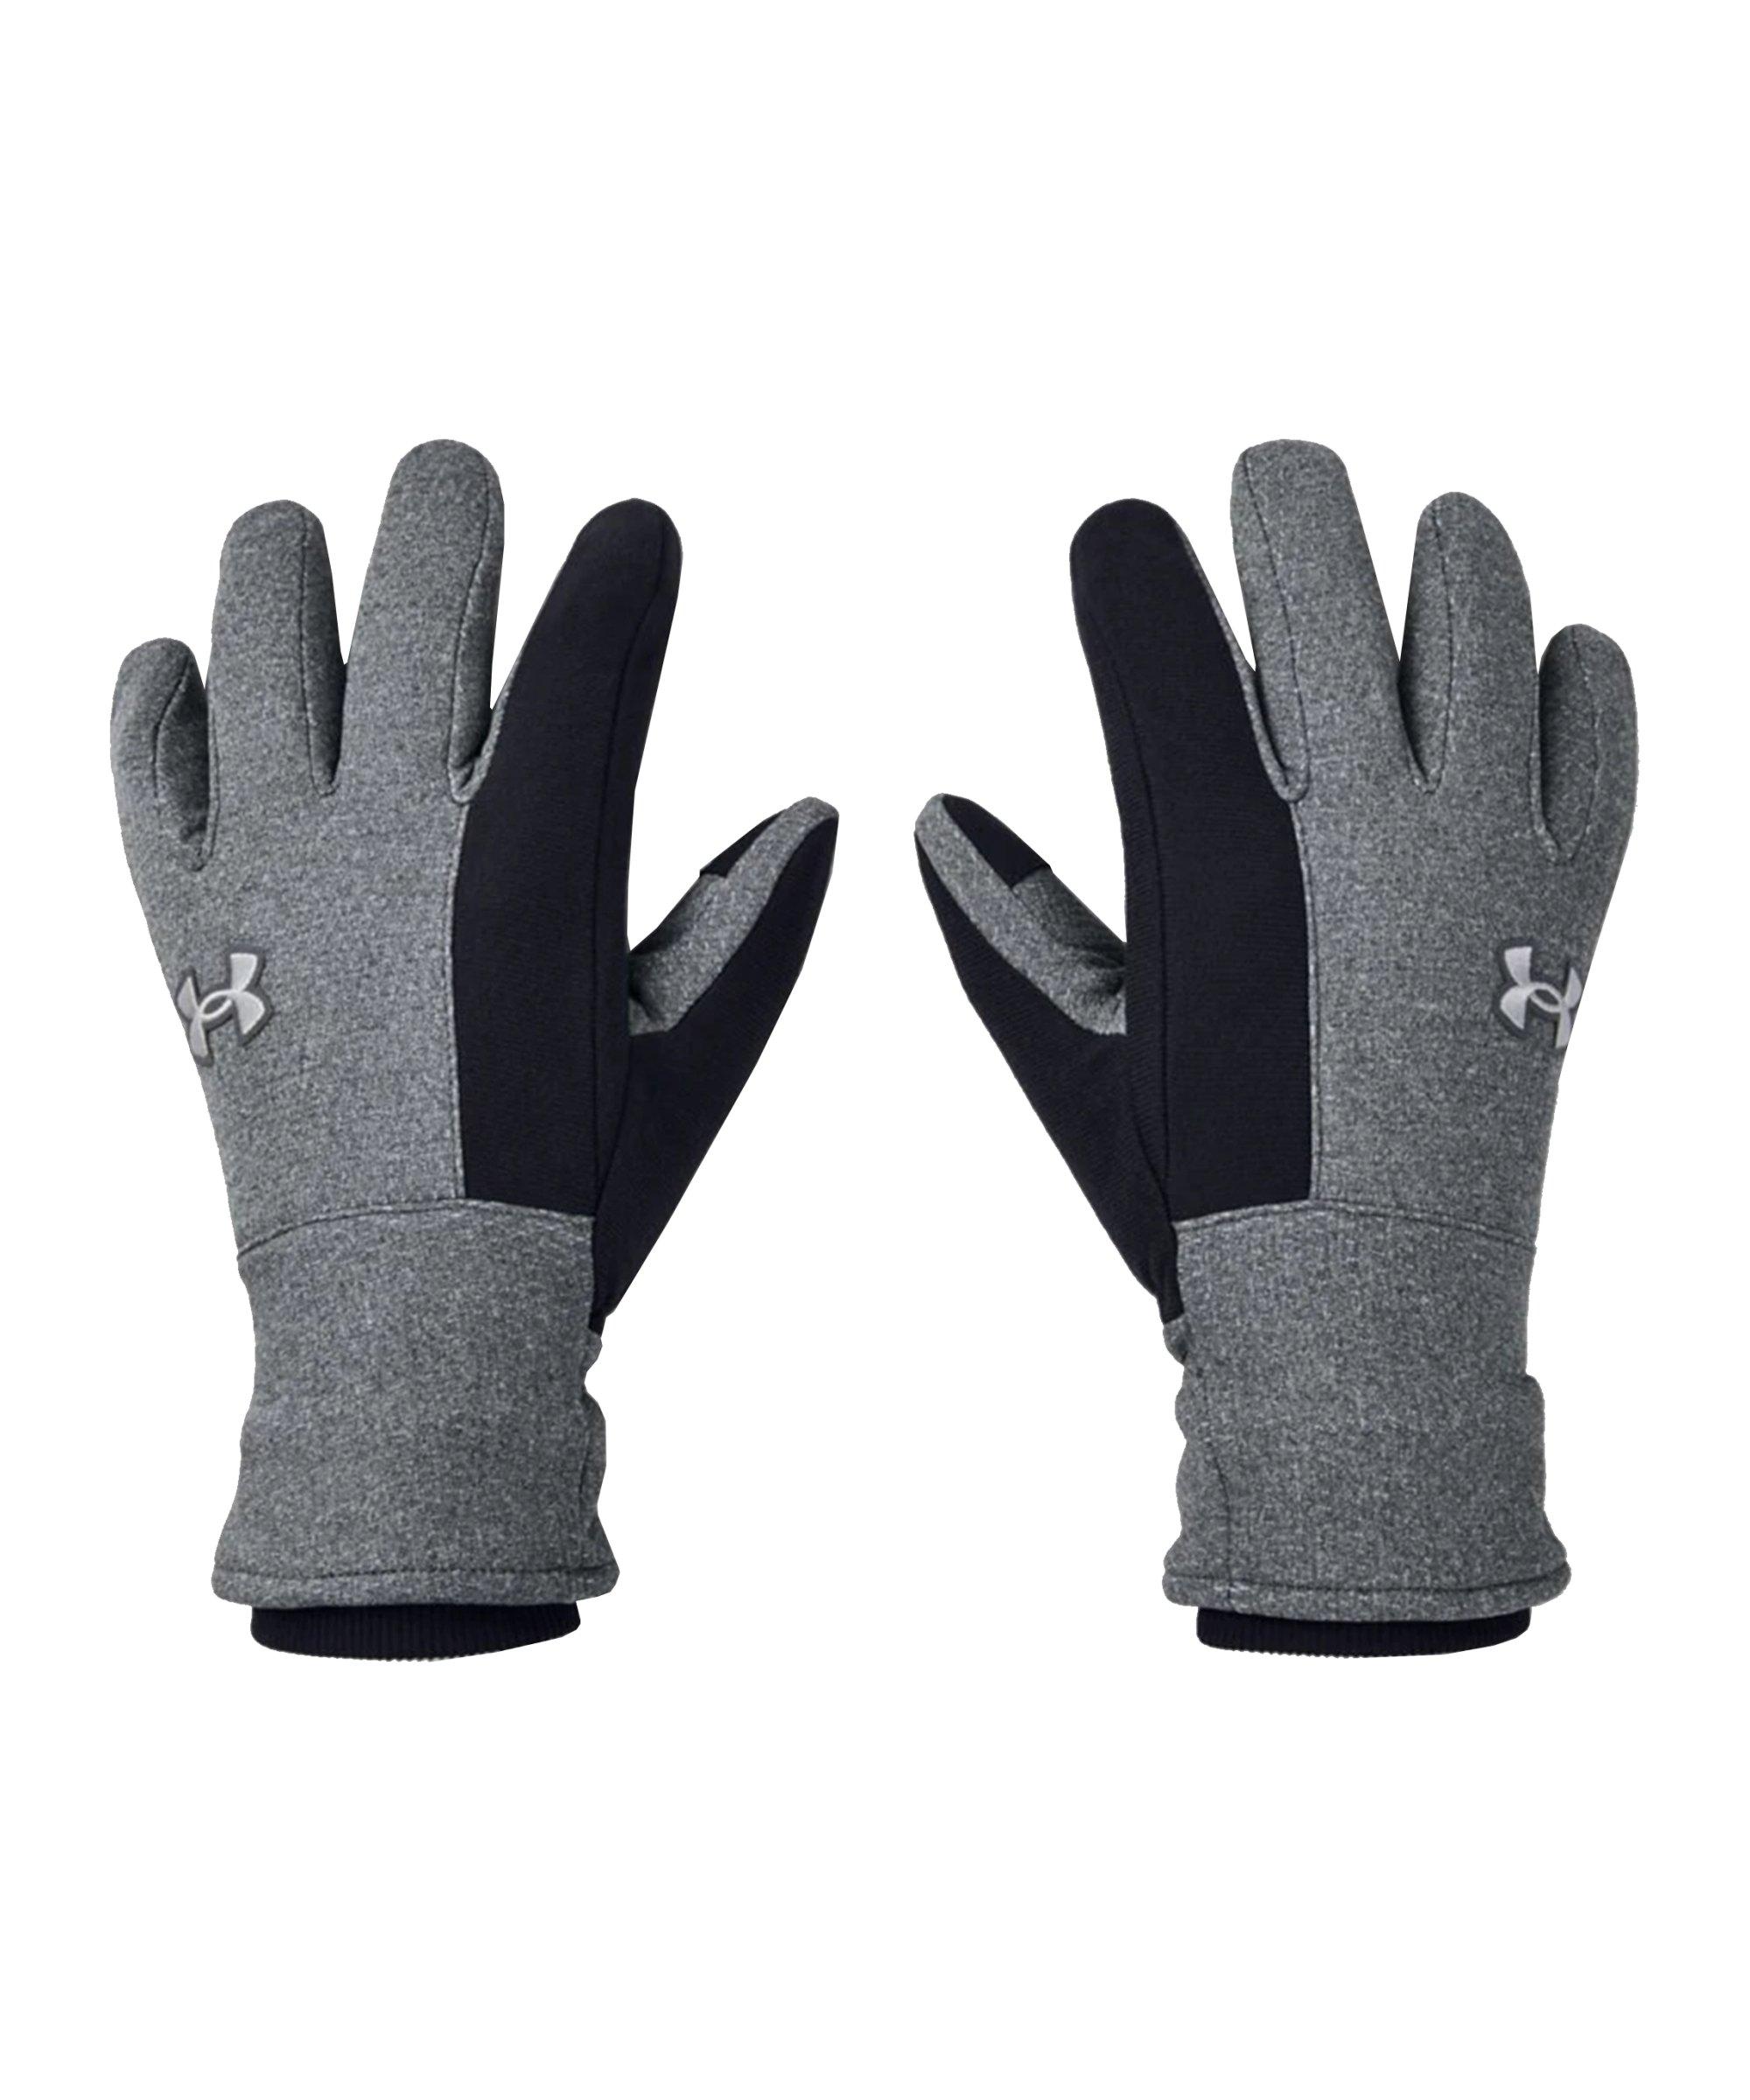 Under Armour Storm Handschuhe Grau F012 - grau